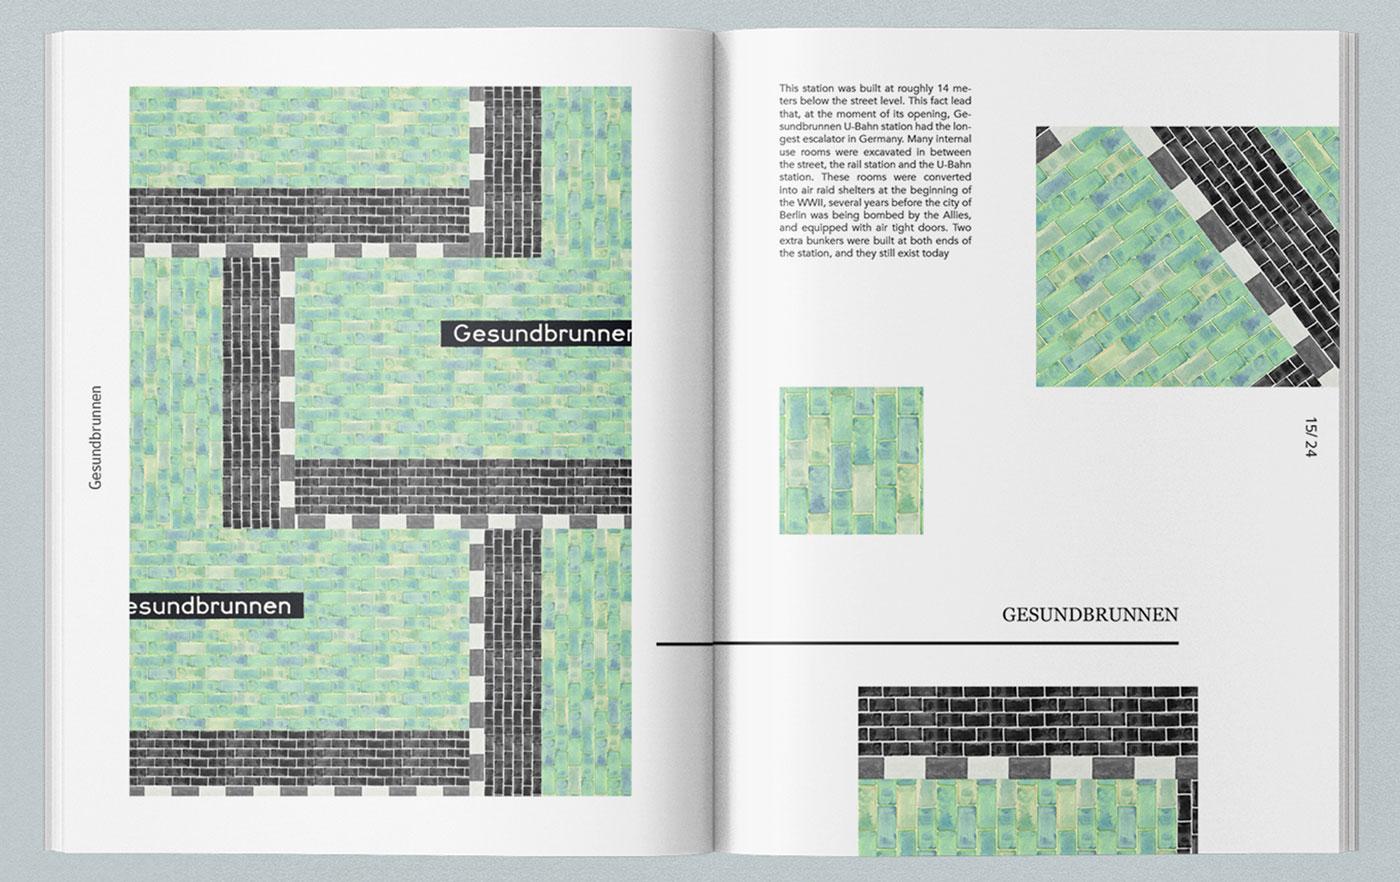 magazine_insides_pages-mockup-3.jpg